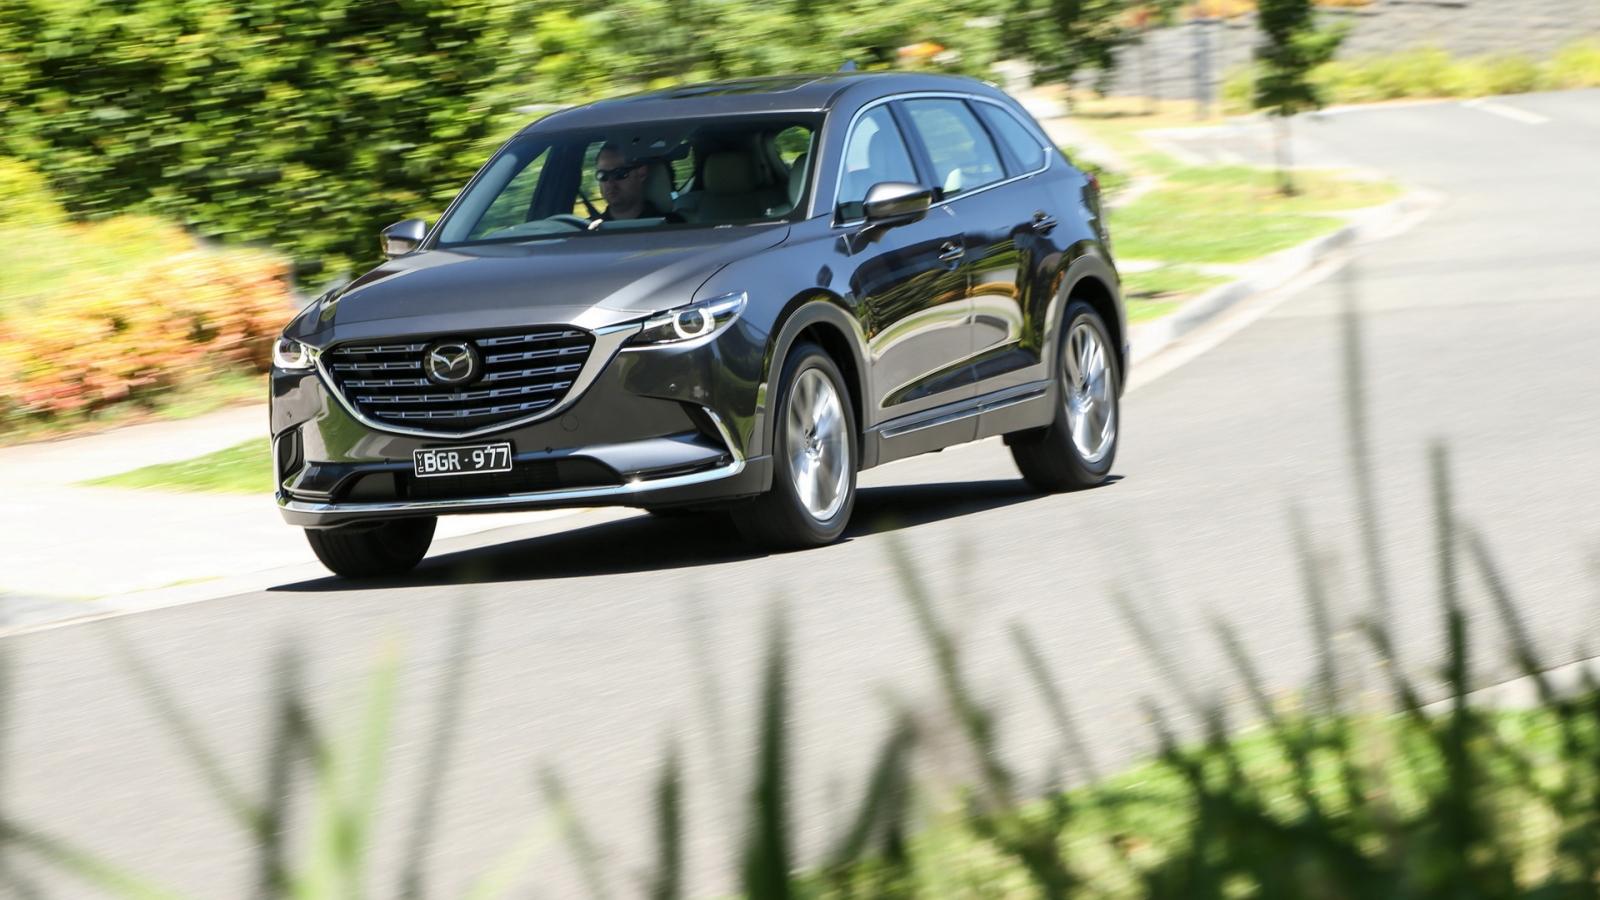 Mazda CX-9 2021 bổ sung thêm 3 biến thể cao cấp